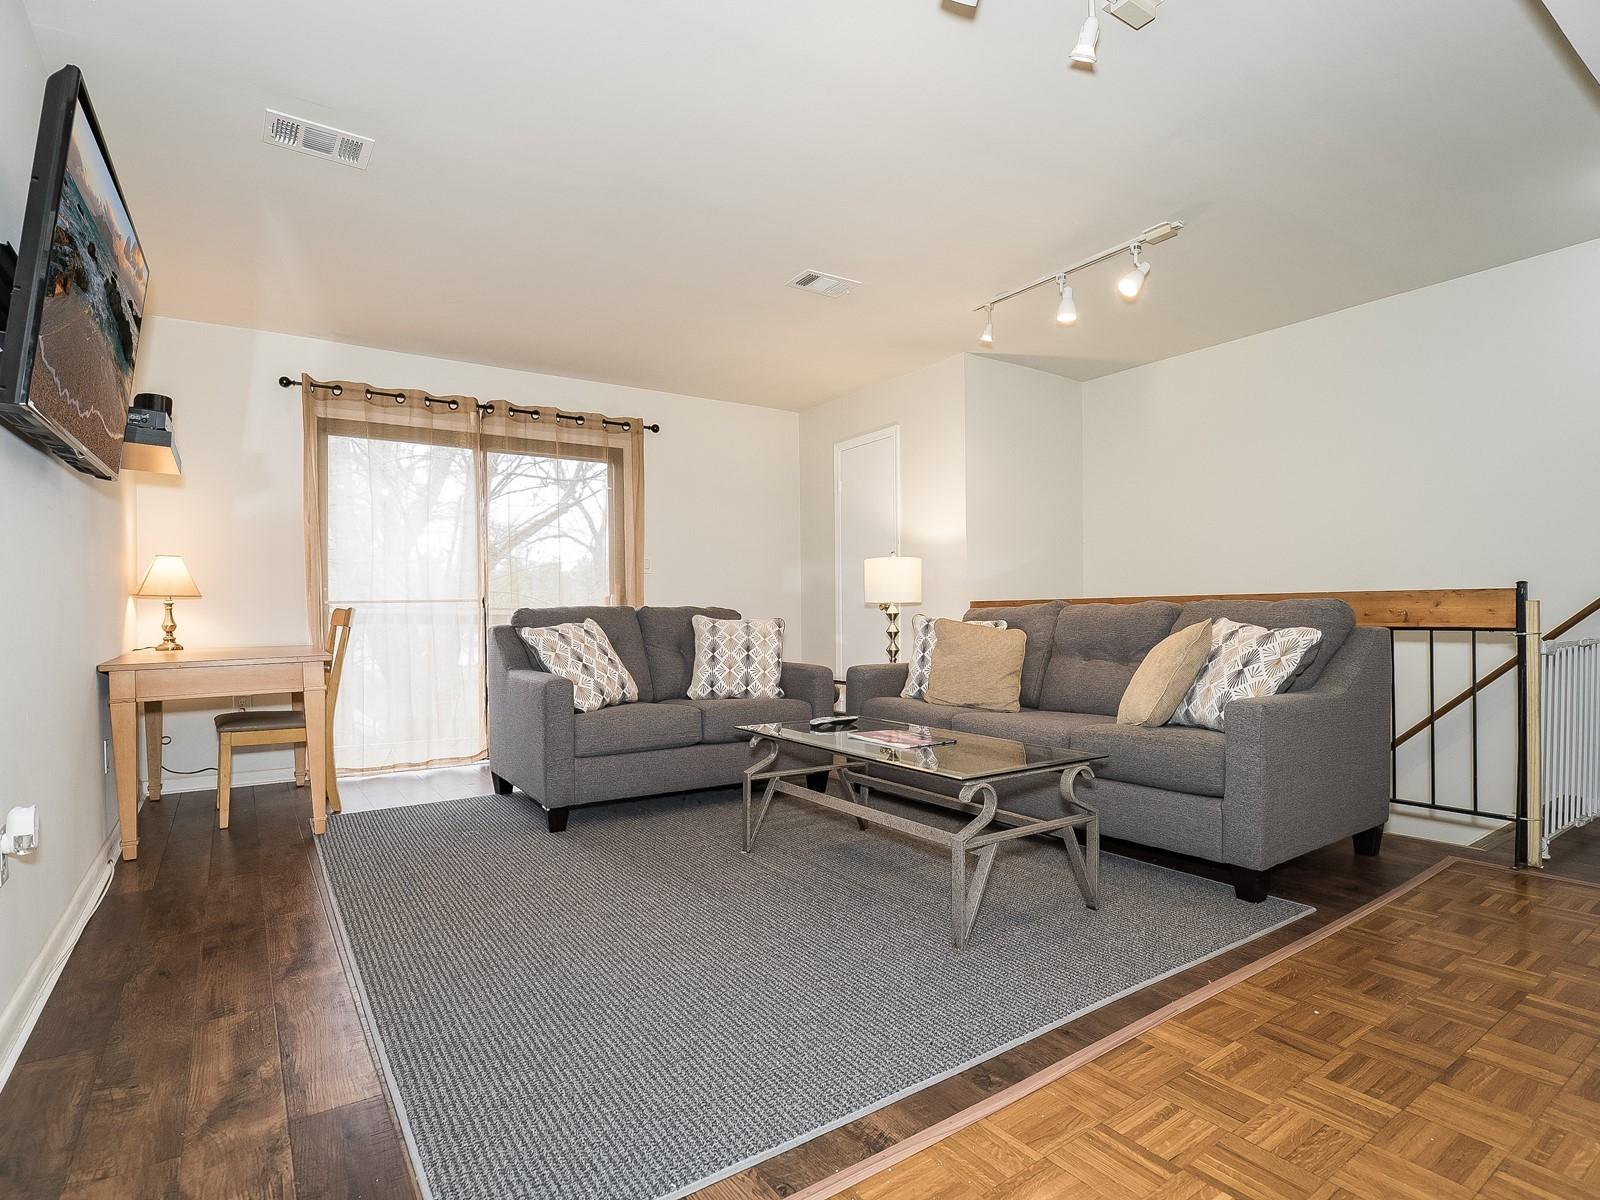 1_Furnished_Apartment_NorthBrunswickNJ_Living Room